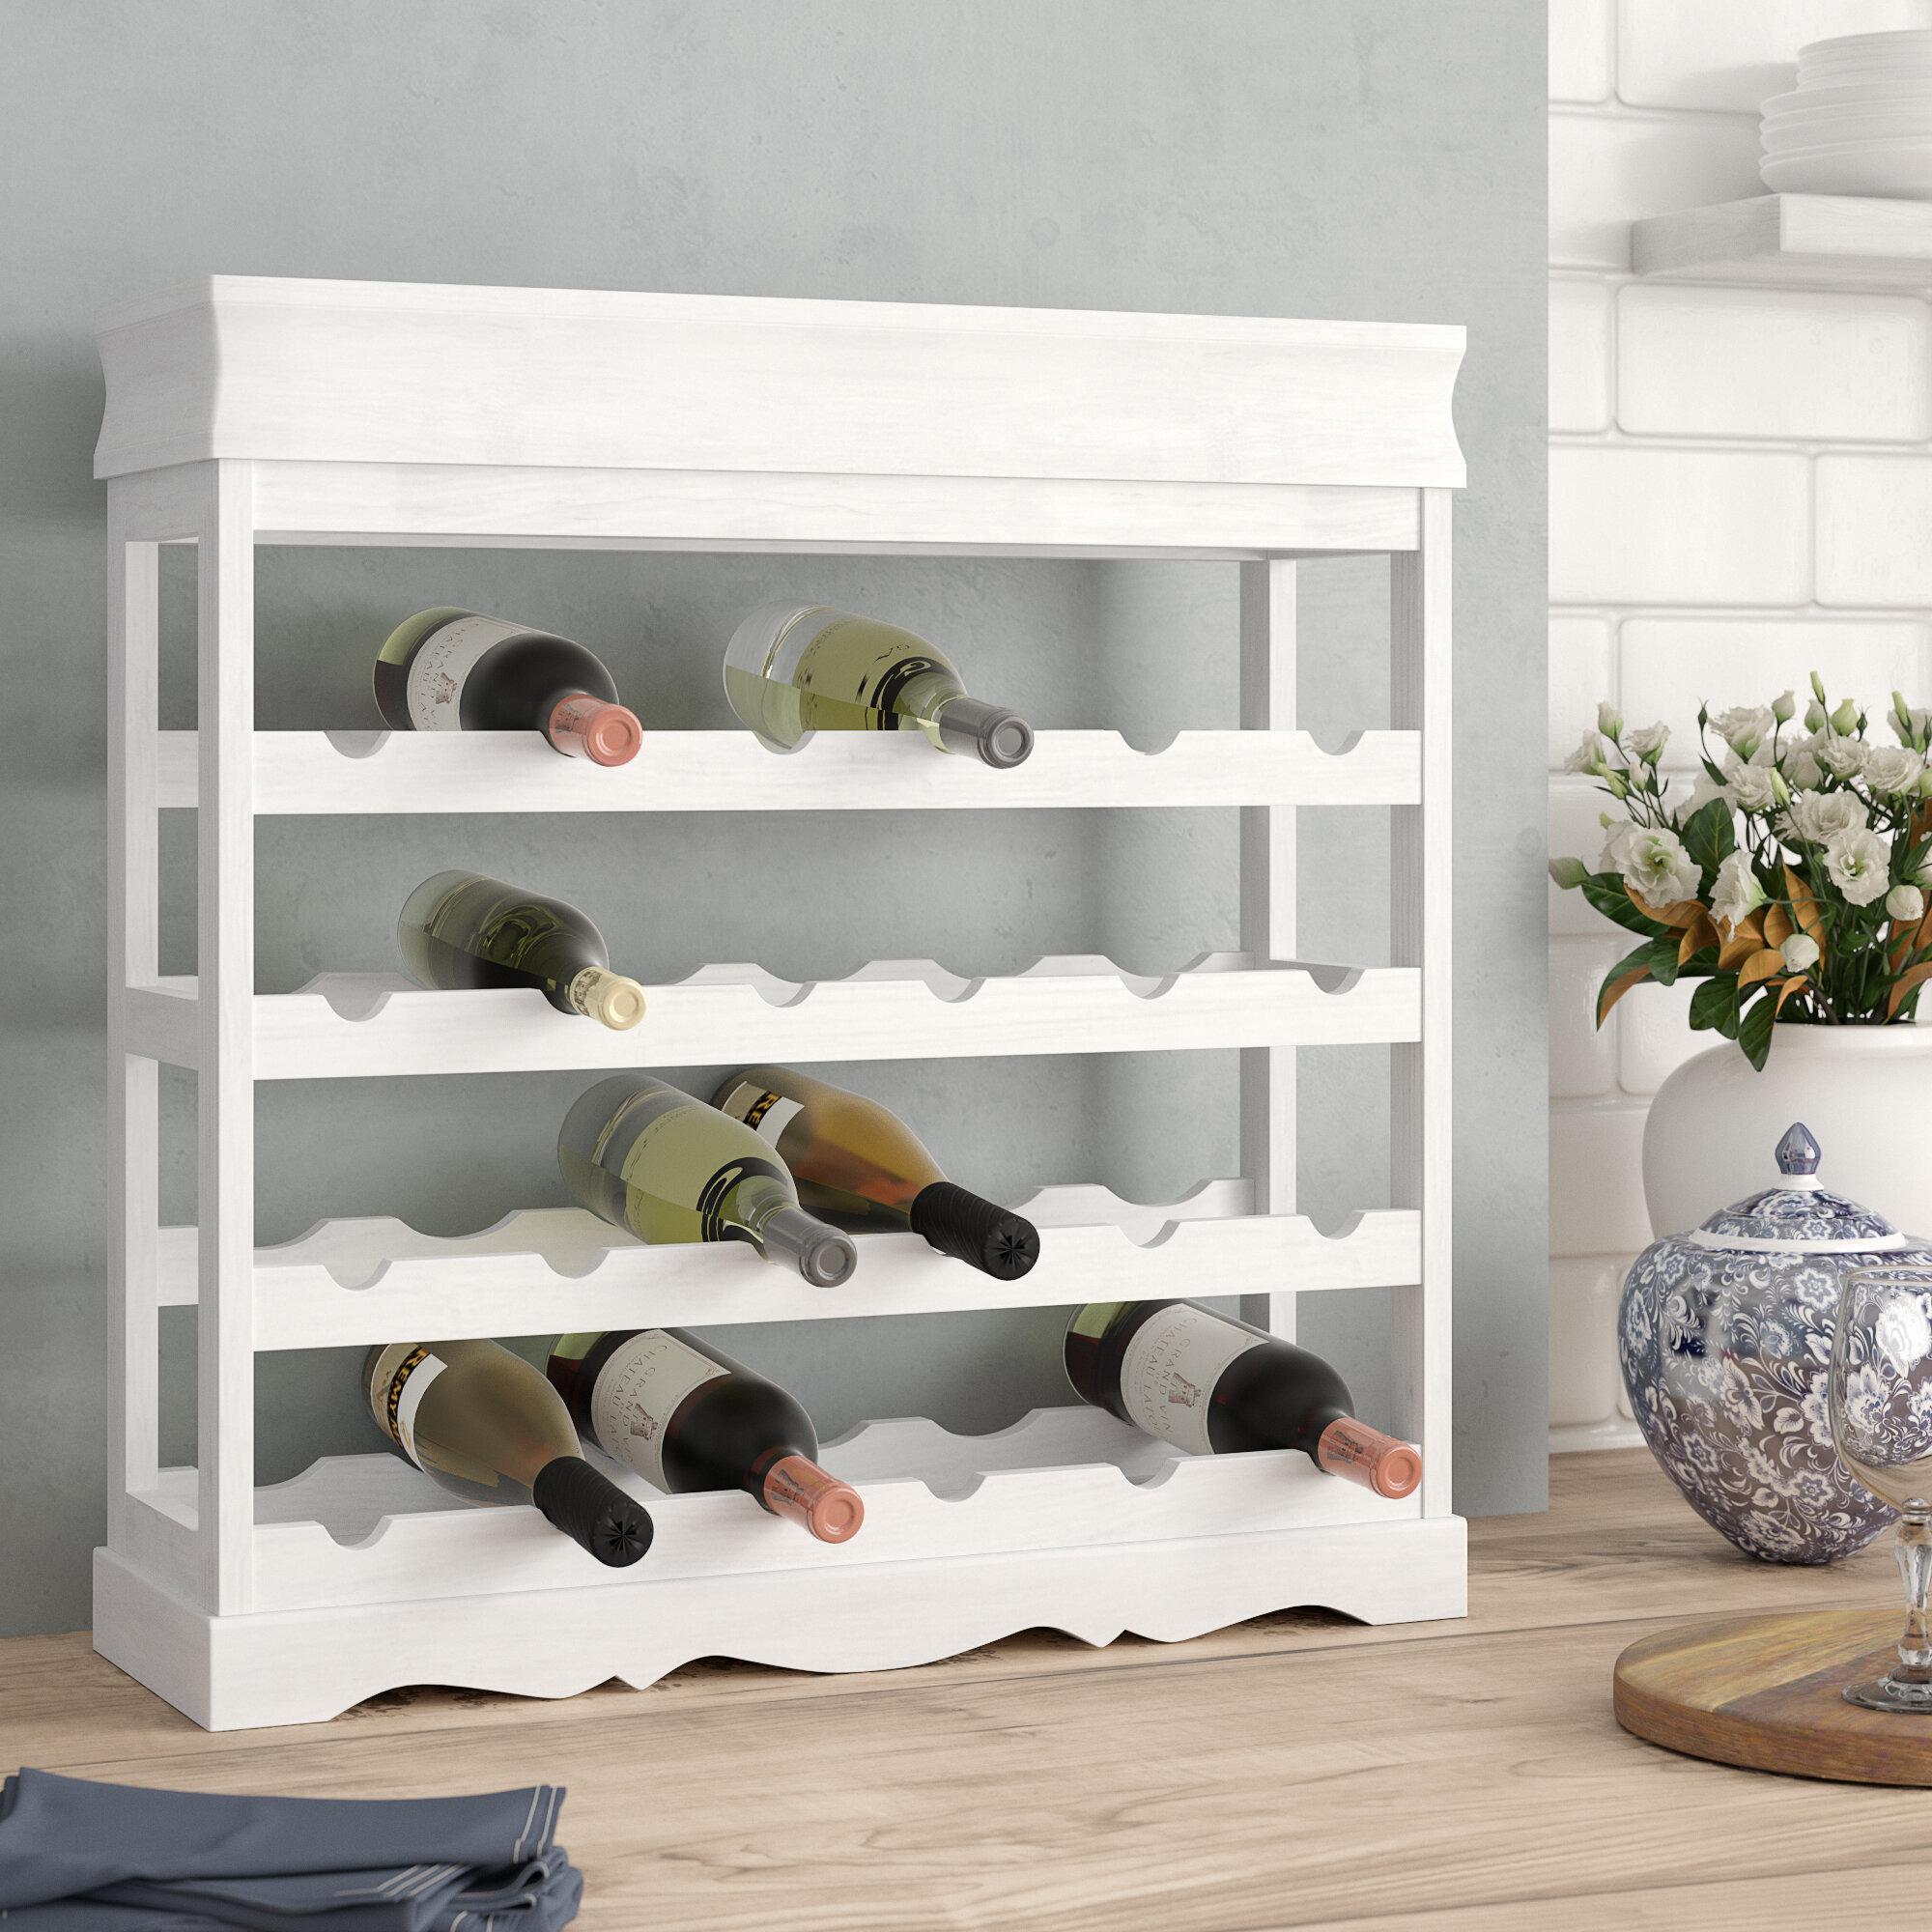 Brambly Cottage Georgetta 24 Bottle Wine Rack Reviews Wayfair Co Uk